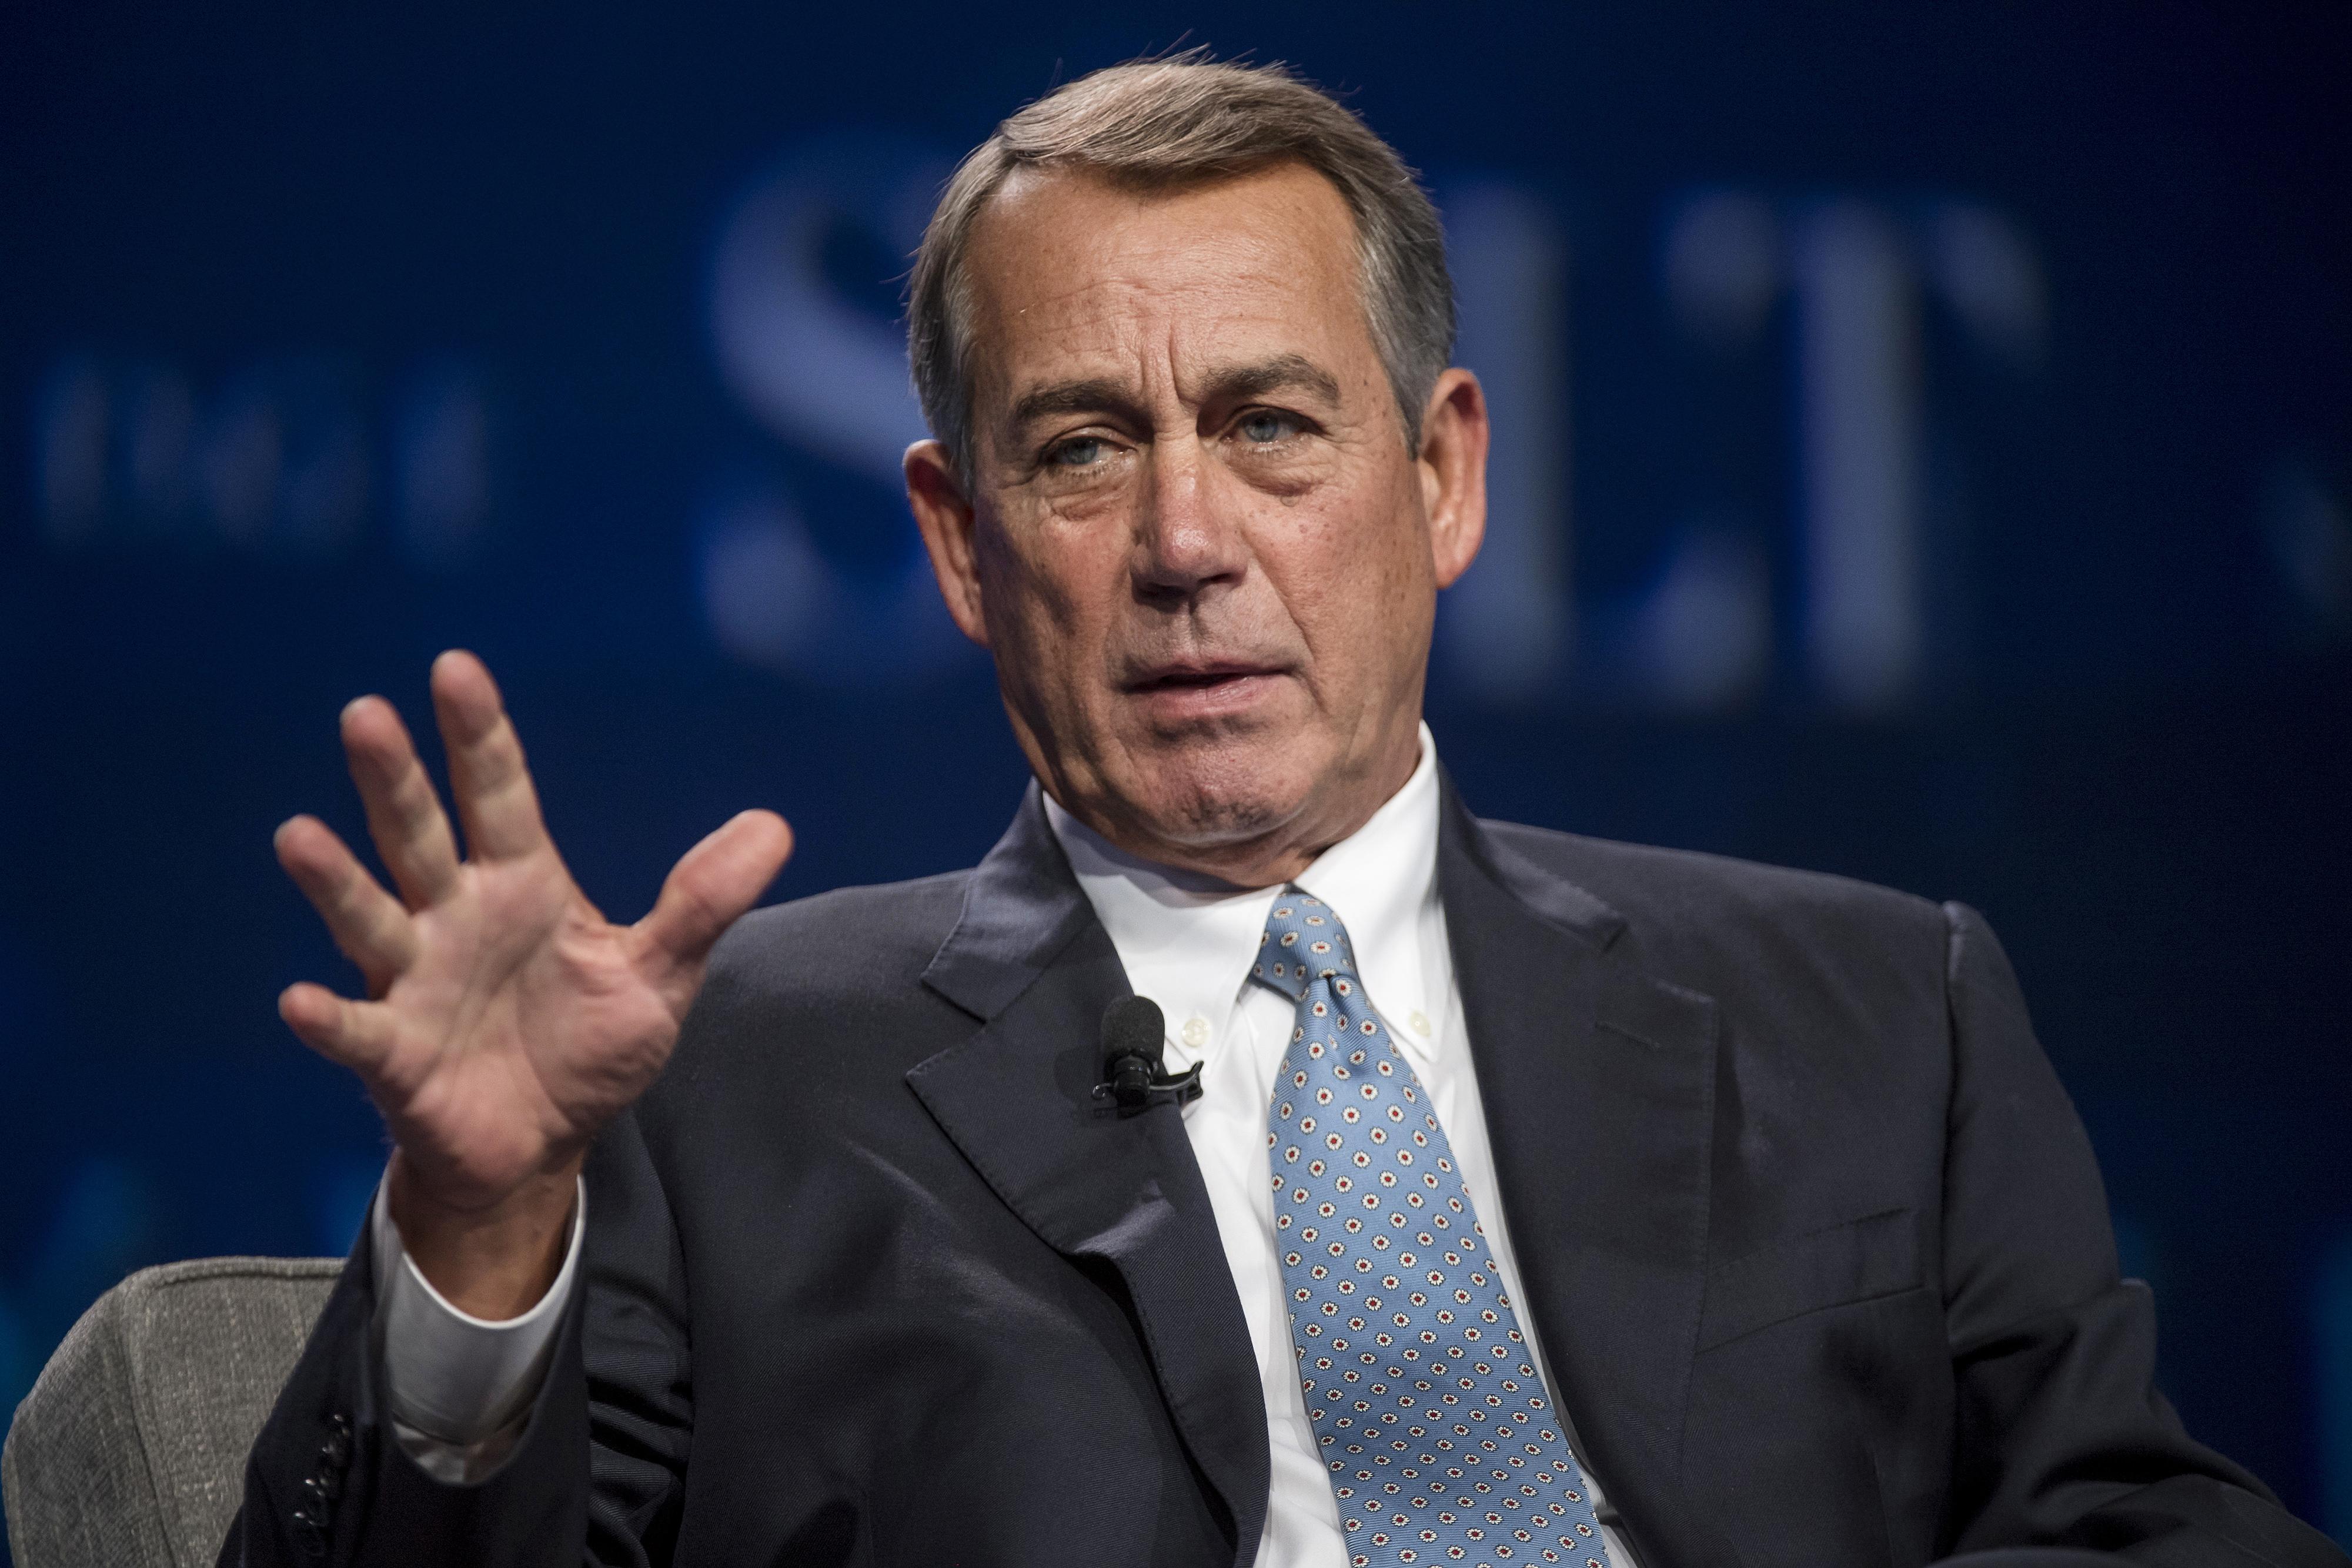 John Boehner, former U.S. House Speaker, speaks during the Skybridge Alternatives (SALT) conference in Las Vegas, Nevada, U.S., on May 12, 2016.